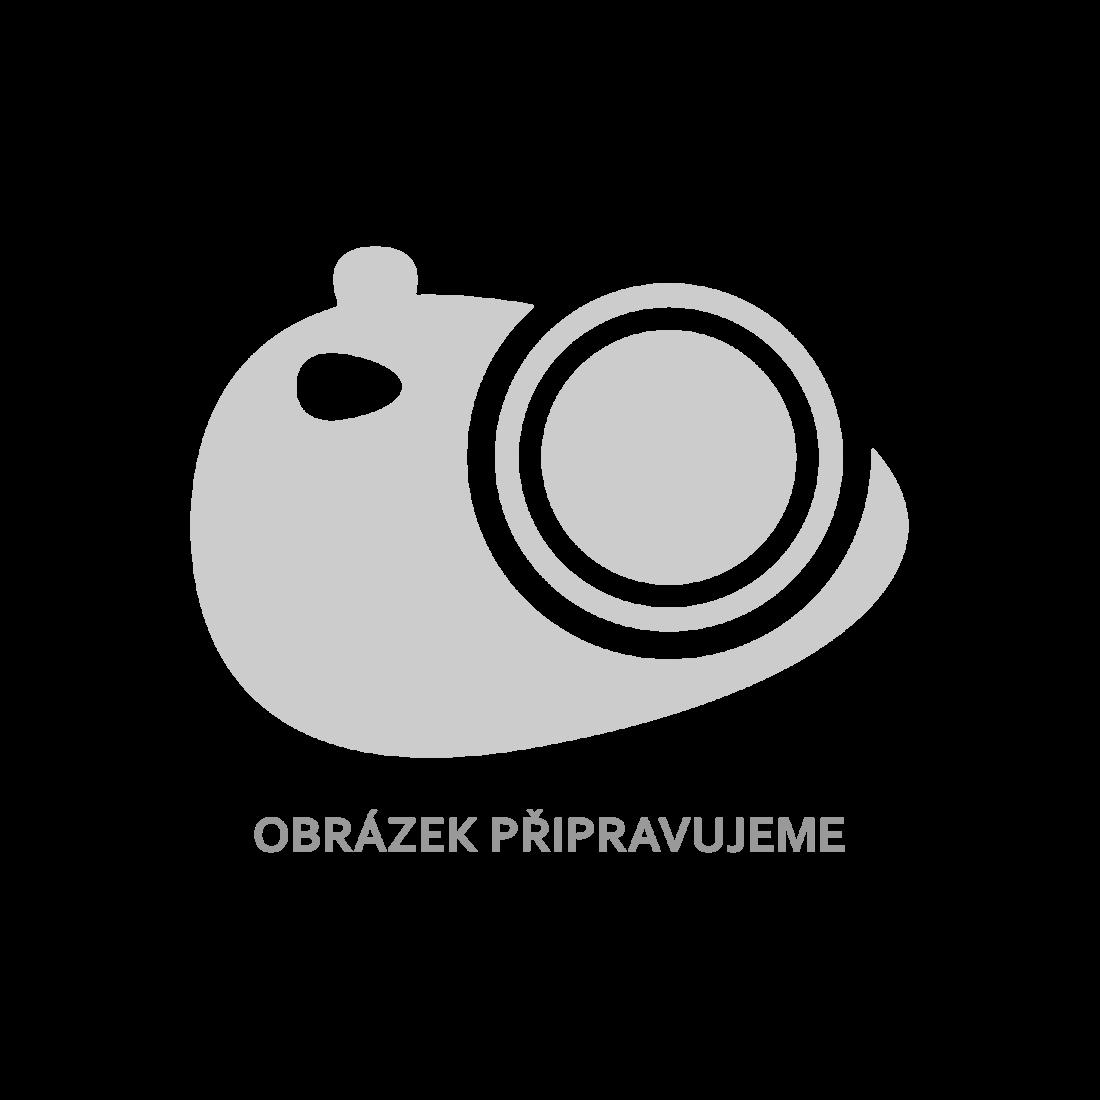 vidaXL 3patrová knihovna černá 60 x 24 x 108 cm dřevotříska [800865]